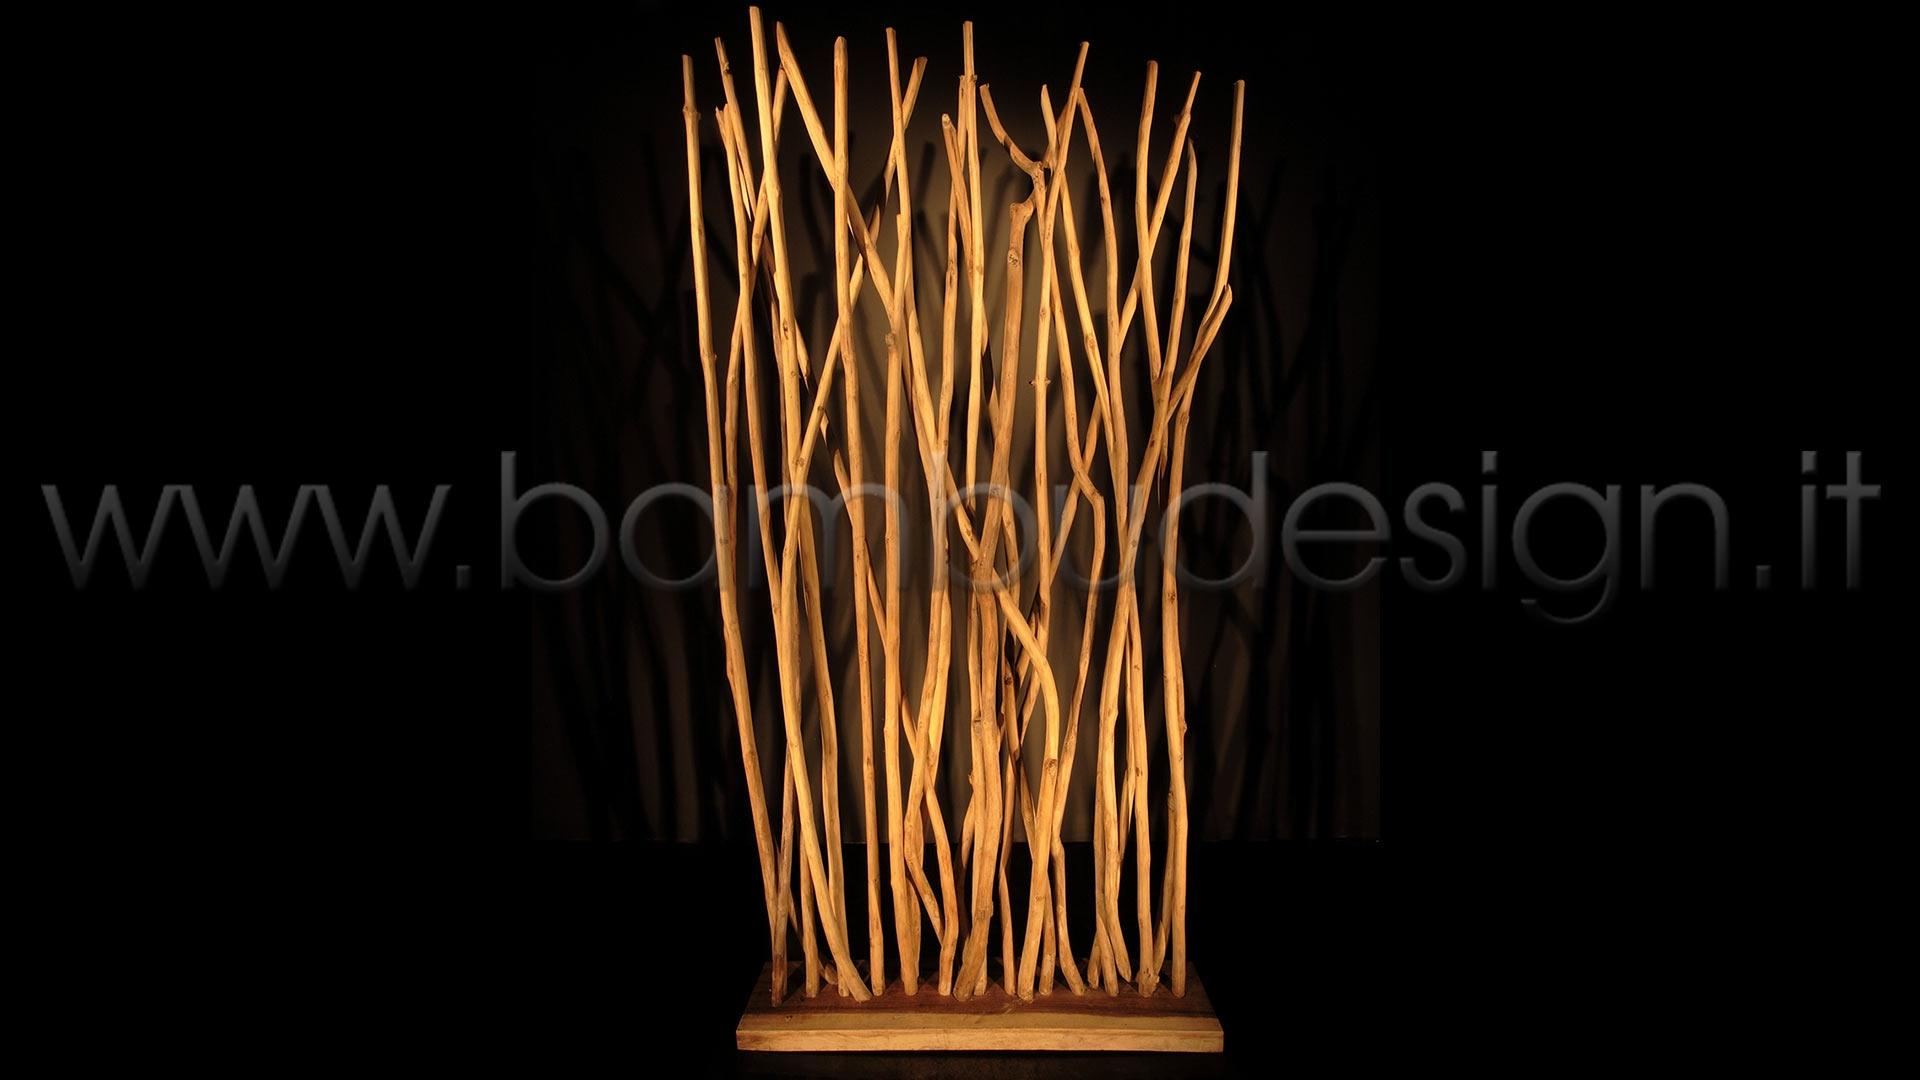 Divisorio rami teak 100 x 20 h 200 bamb design milano - Rami decorativi legno ...